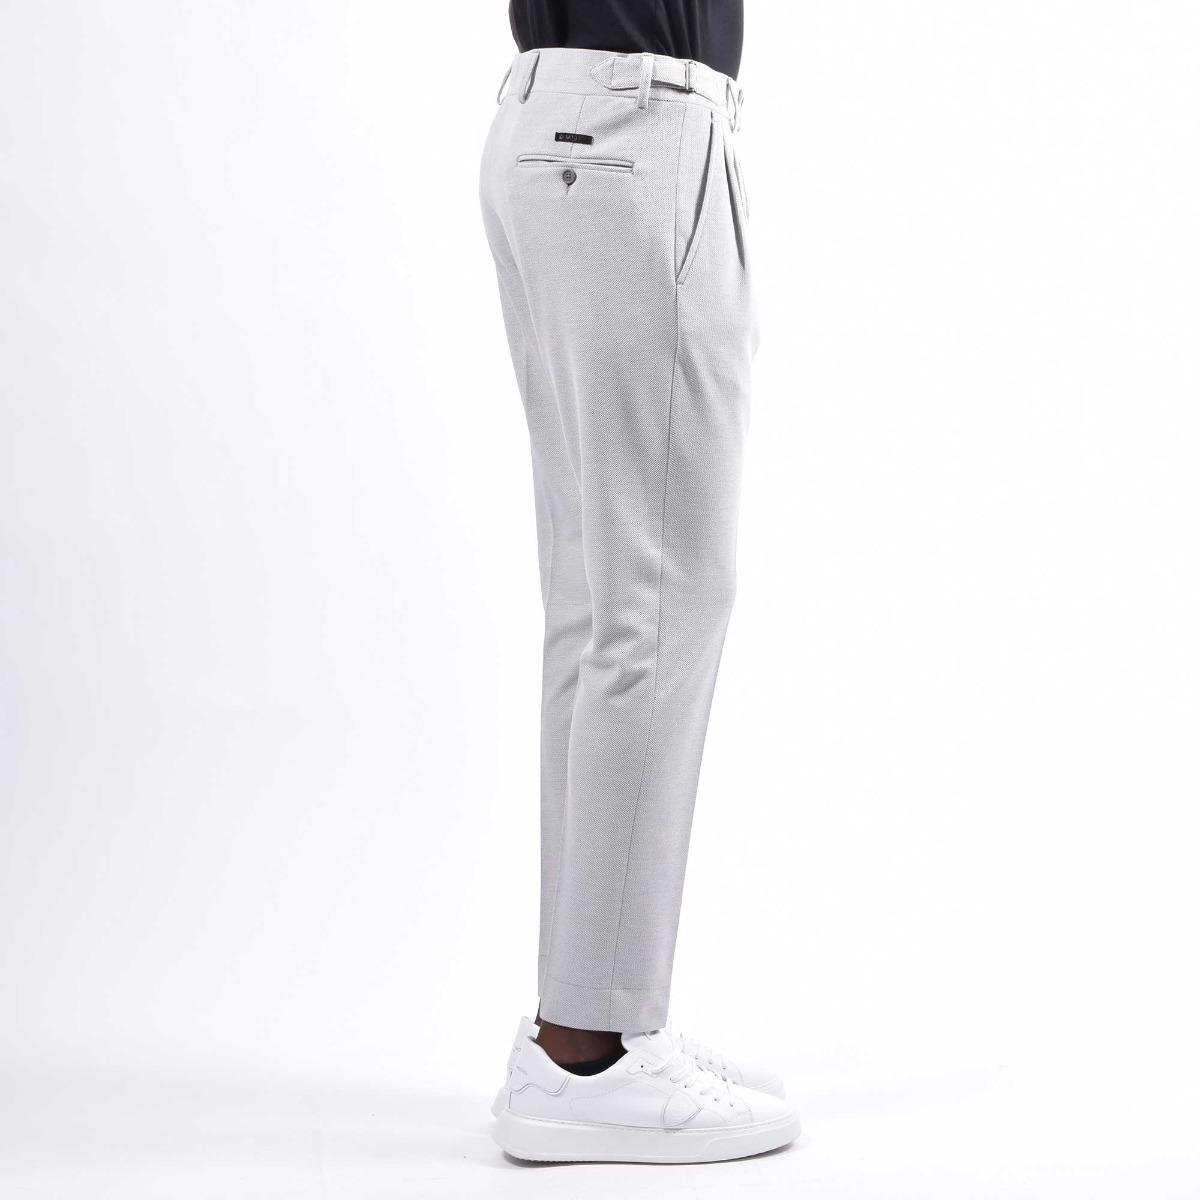 Pantalone pences fibbie - Grigio